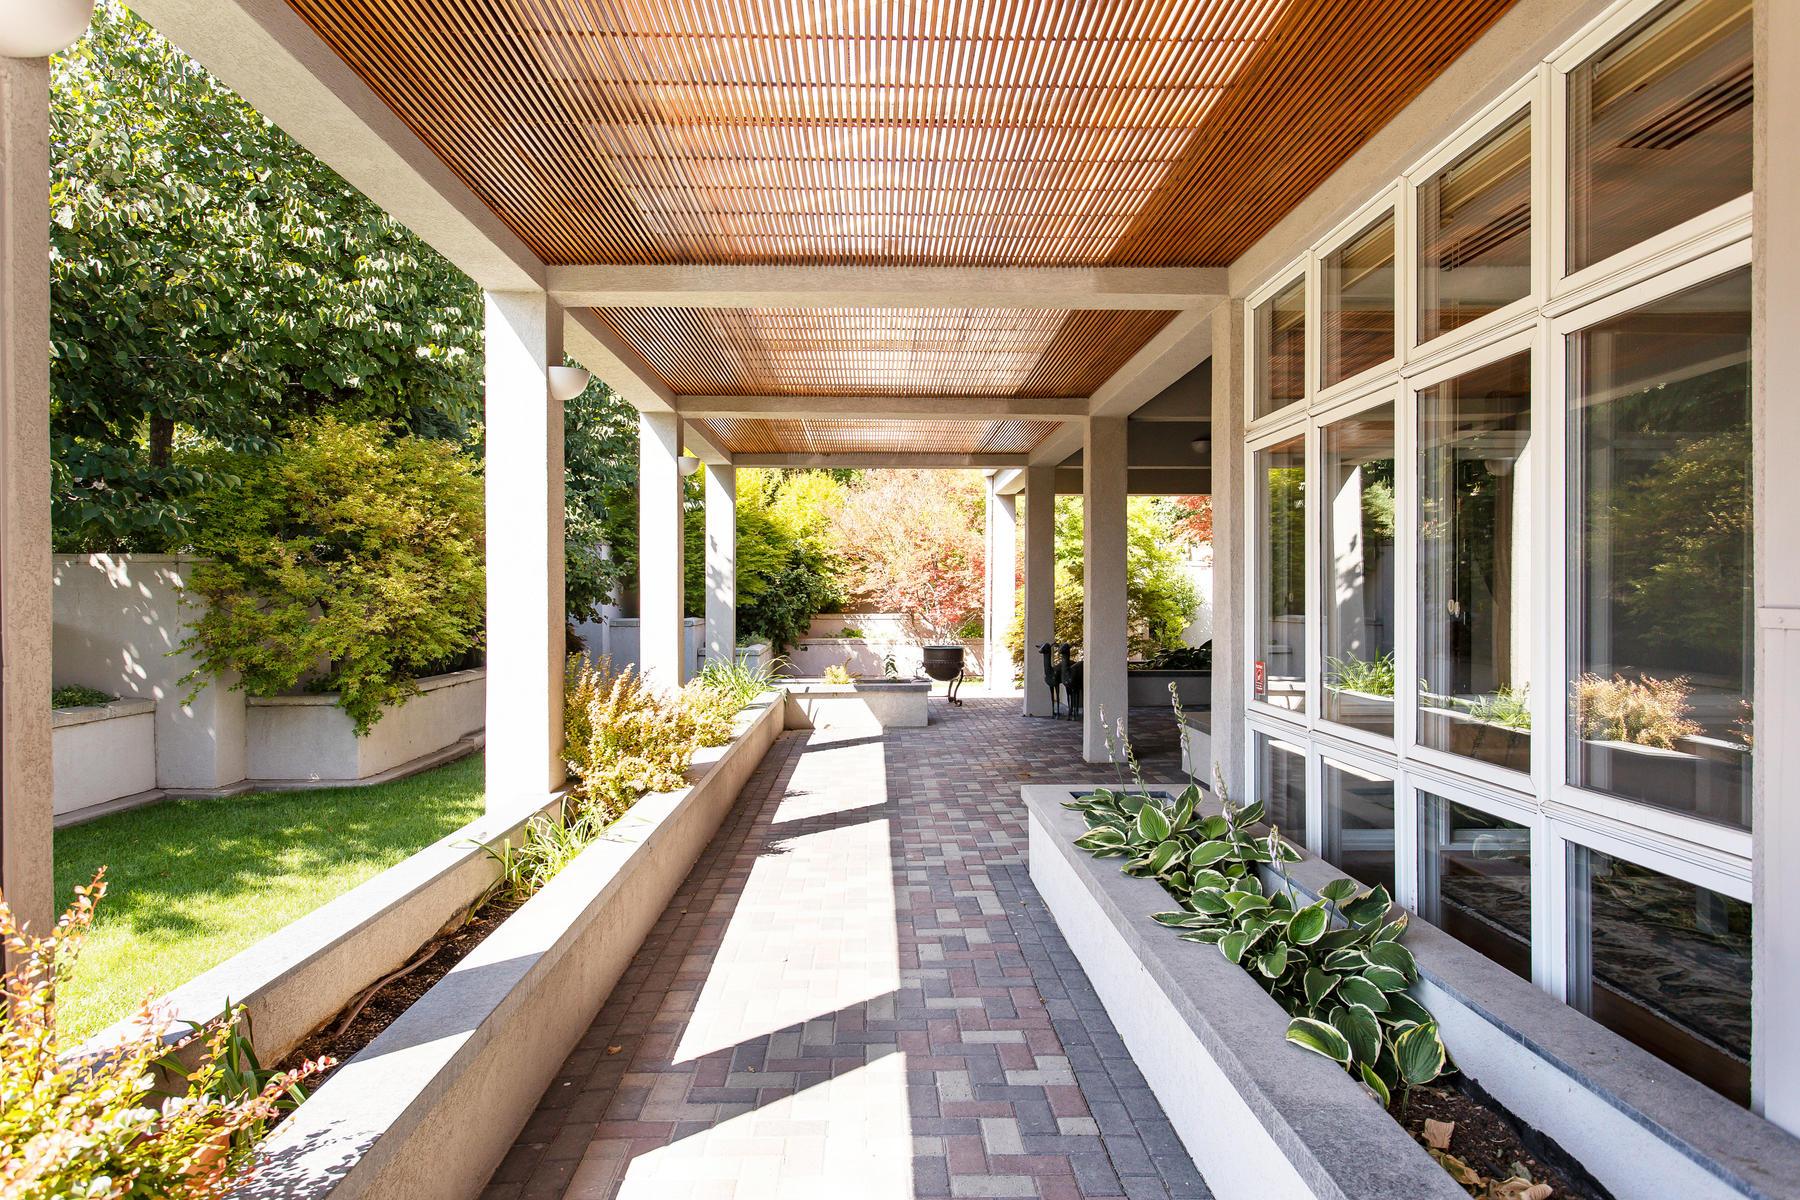 Single Family Homes for Sale at Architectural Gem 1066 N Oak Forest Rd Salt Lake City, Utah 84103 United States